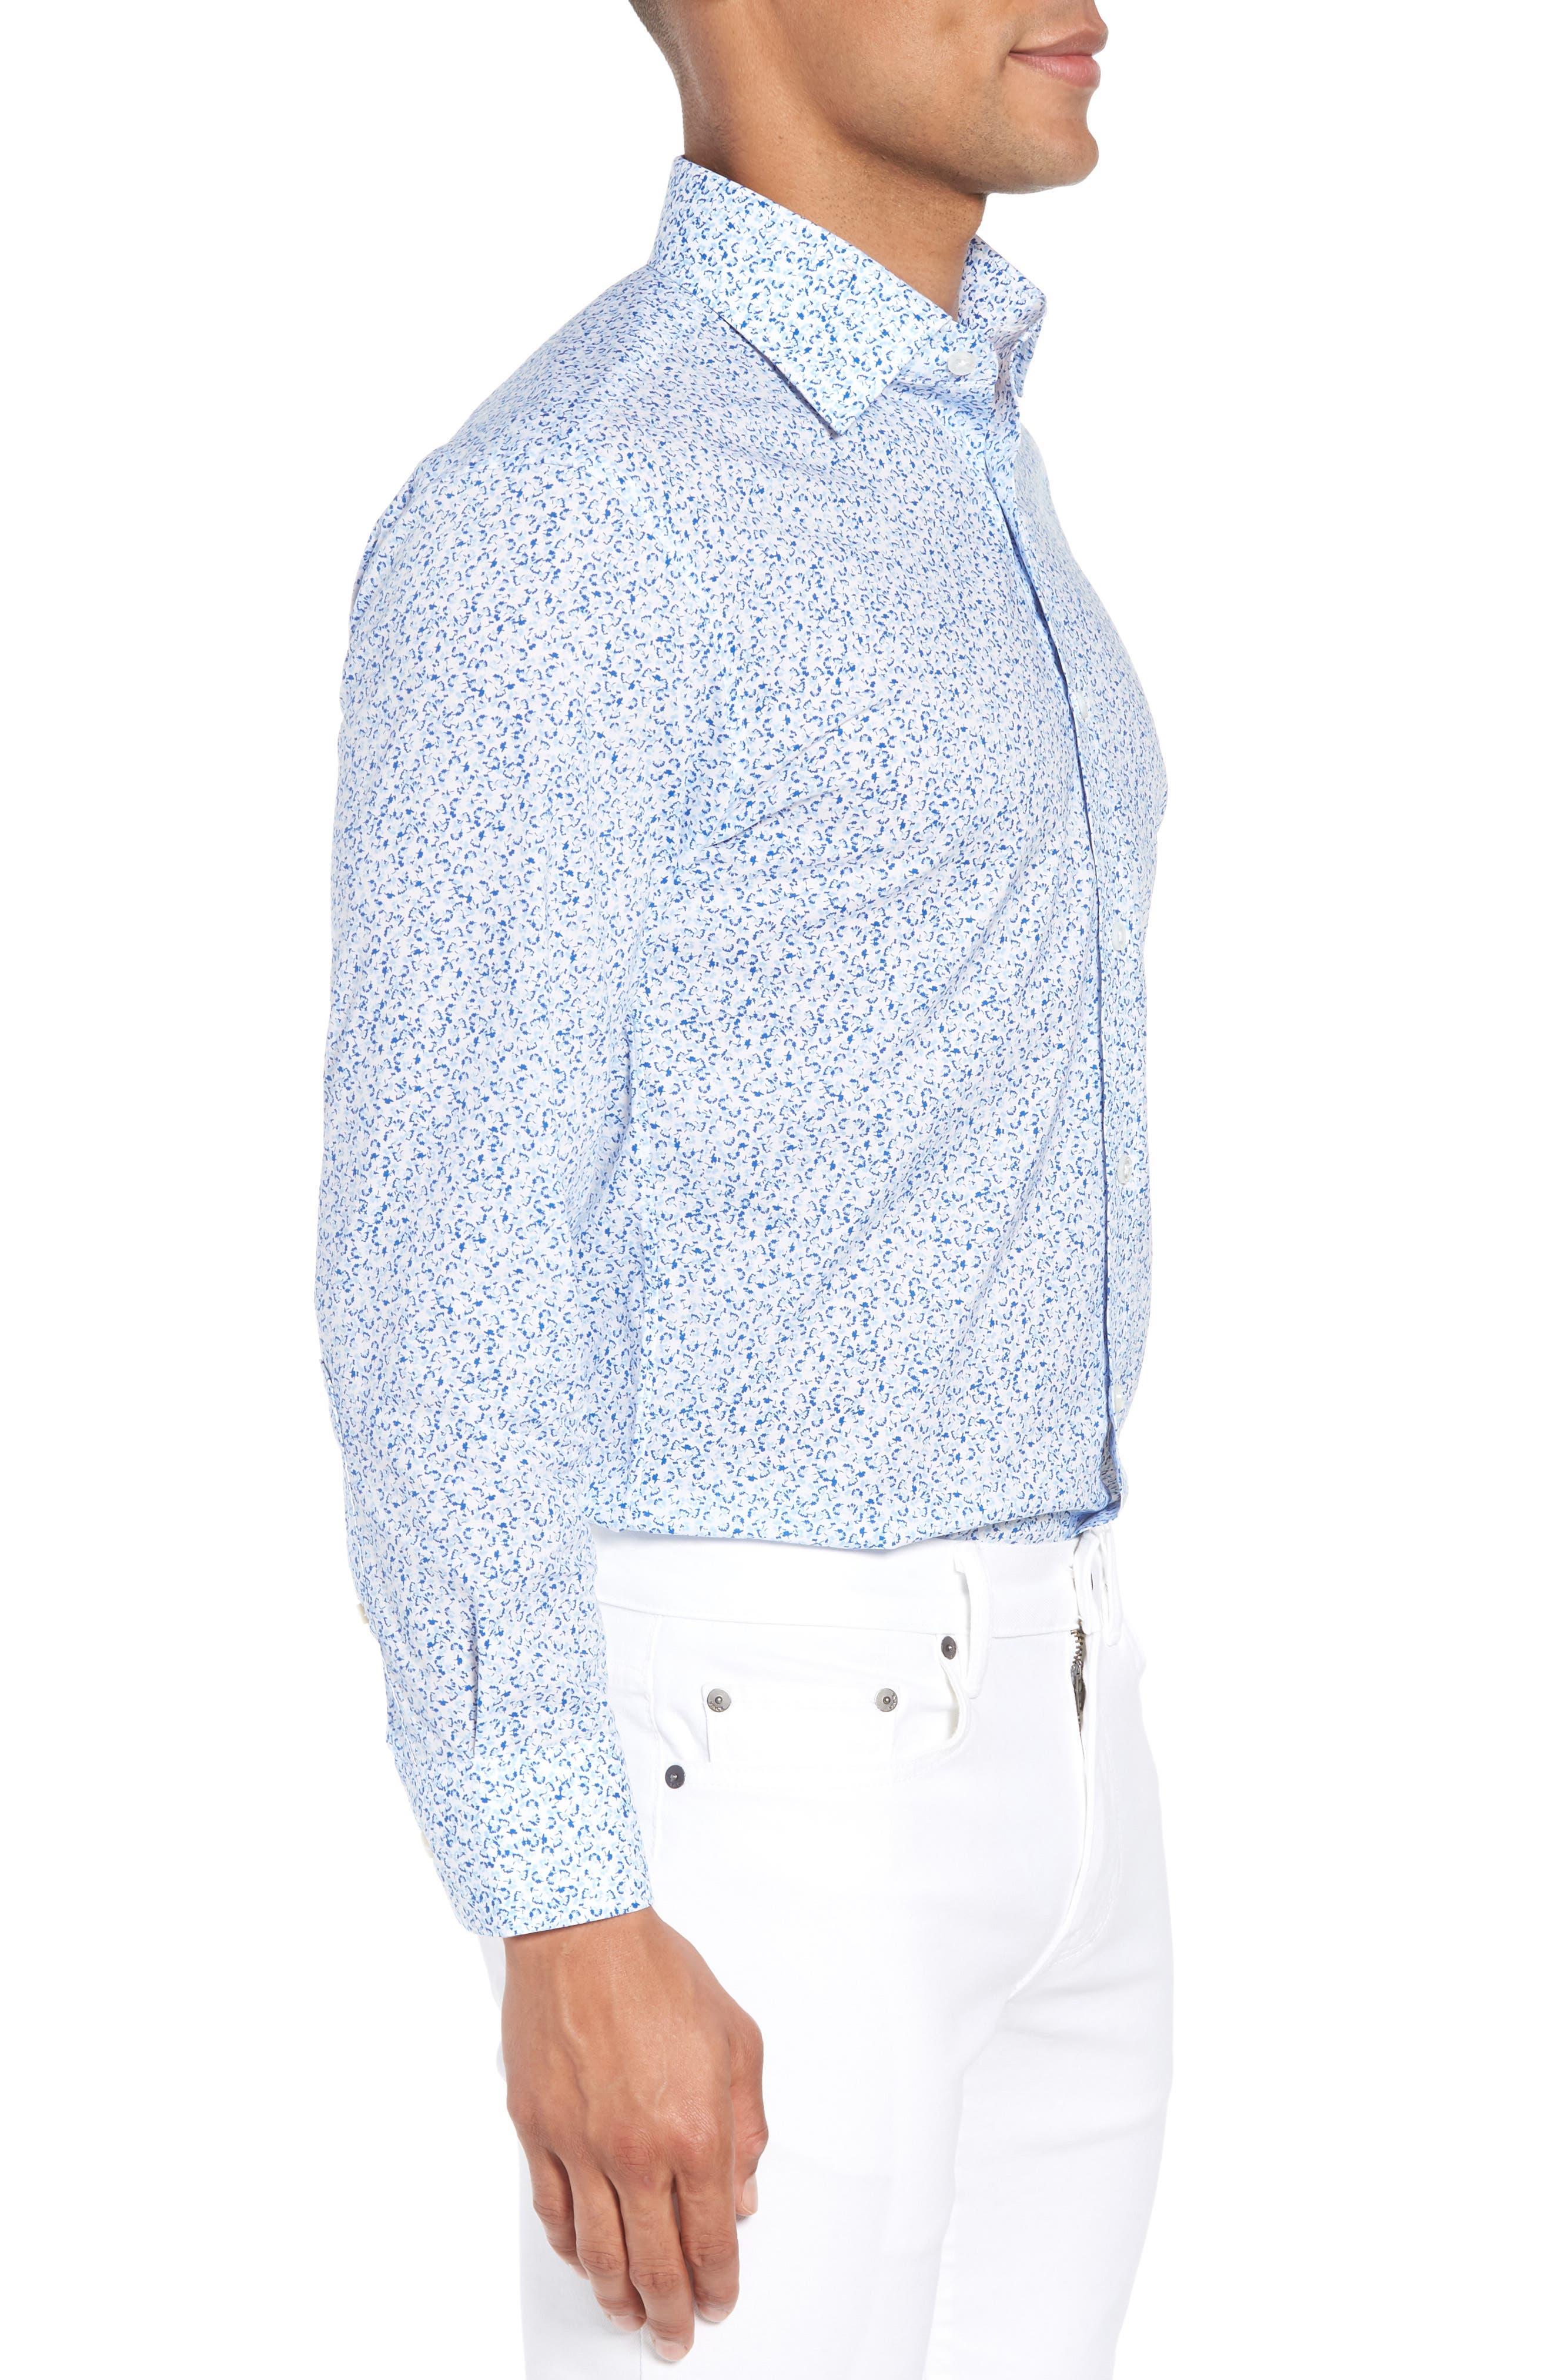 Jetsetter Slim Fit Floral Dress Shirt,                             Alternate thumbnail 4, color,                             400